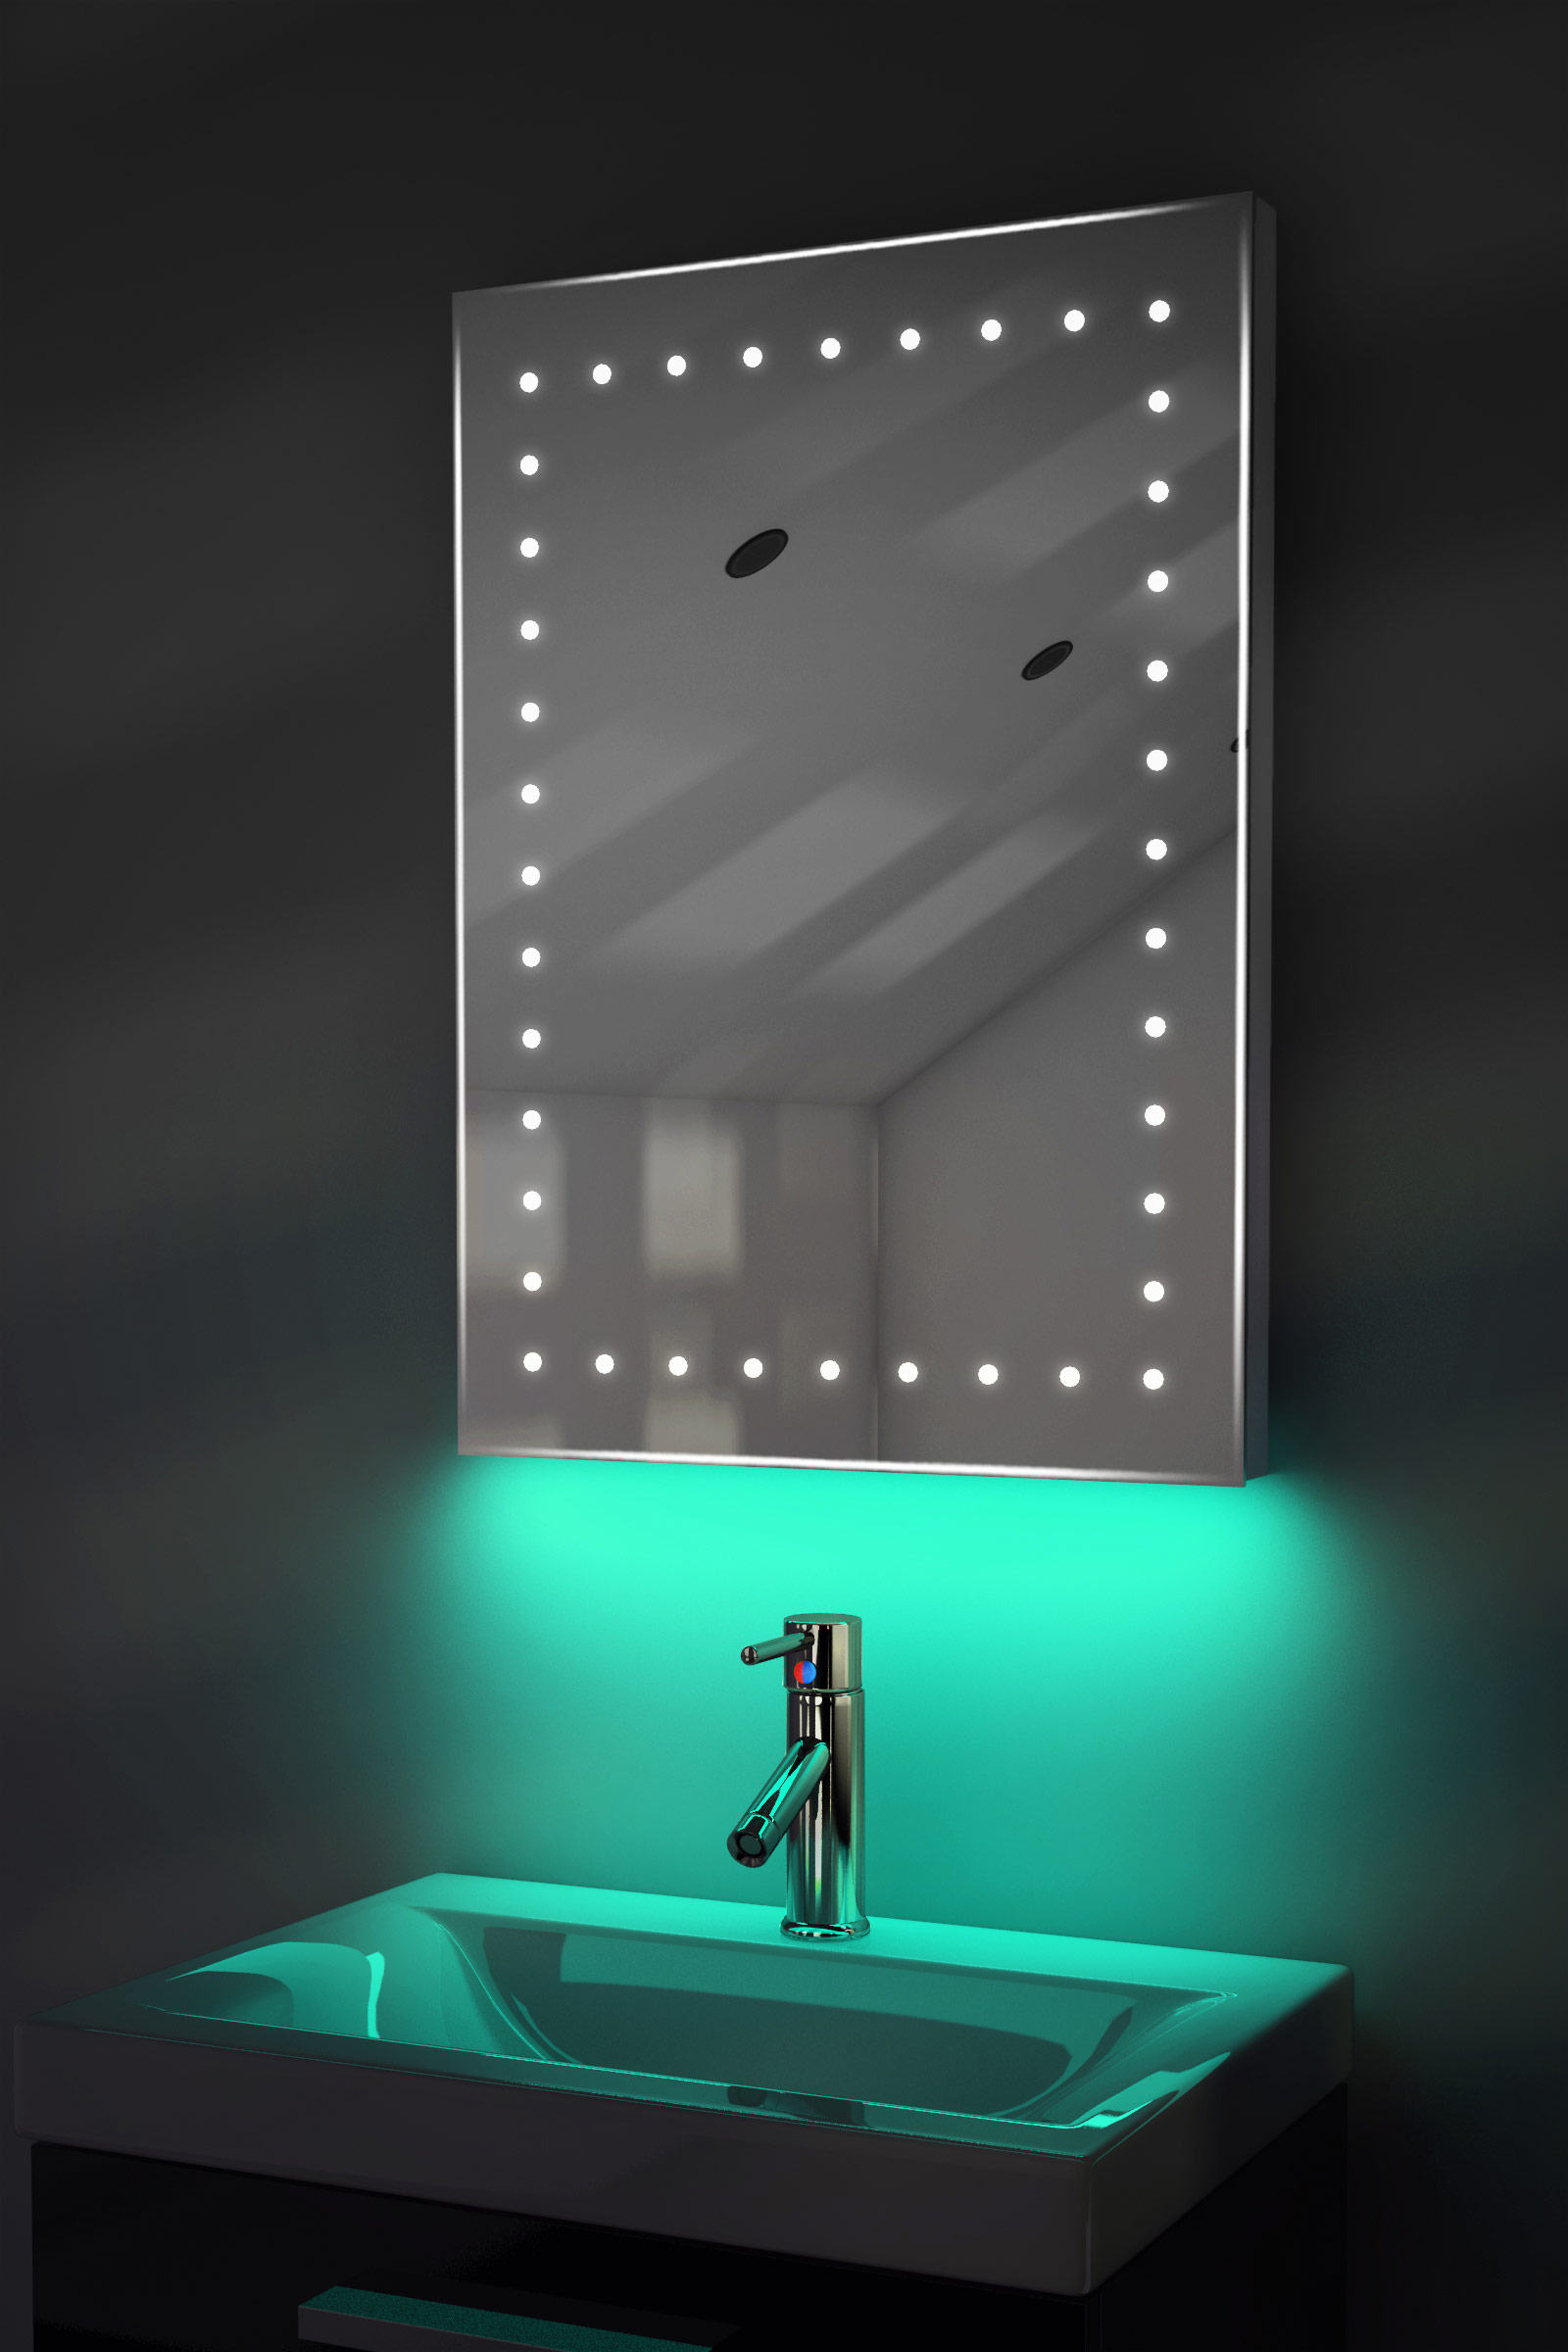 Ambient Ultra Slim Led Bathroom Mirror With Demister Pad Sensor Jerdon Mounted Wiring Diagram K168 K168t Ebay